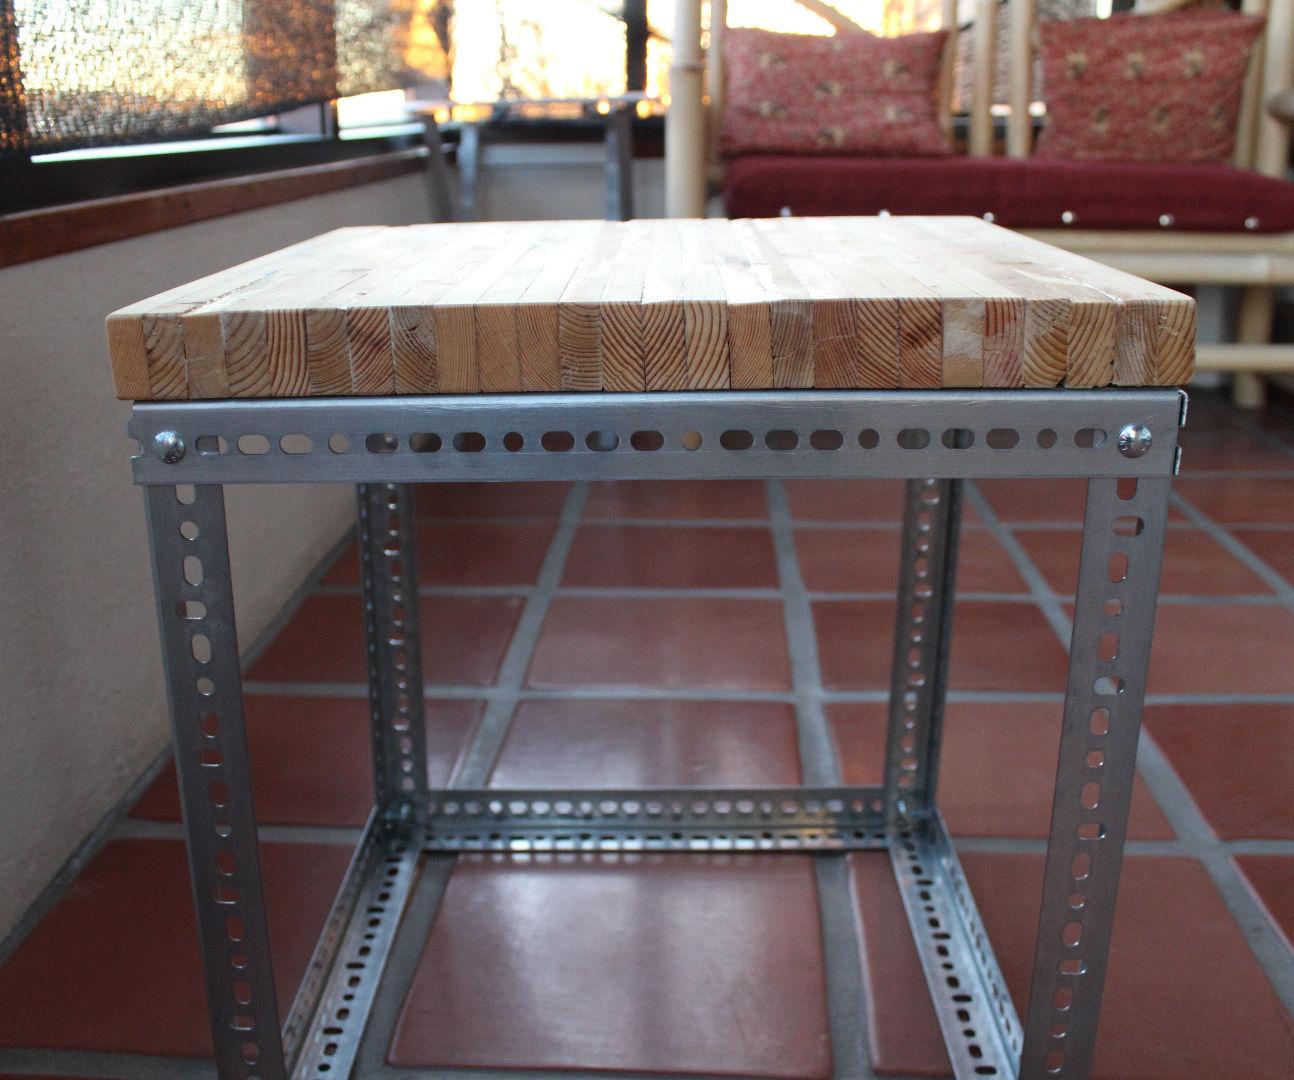 Modern/Industrial Pallet Table